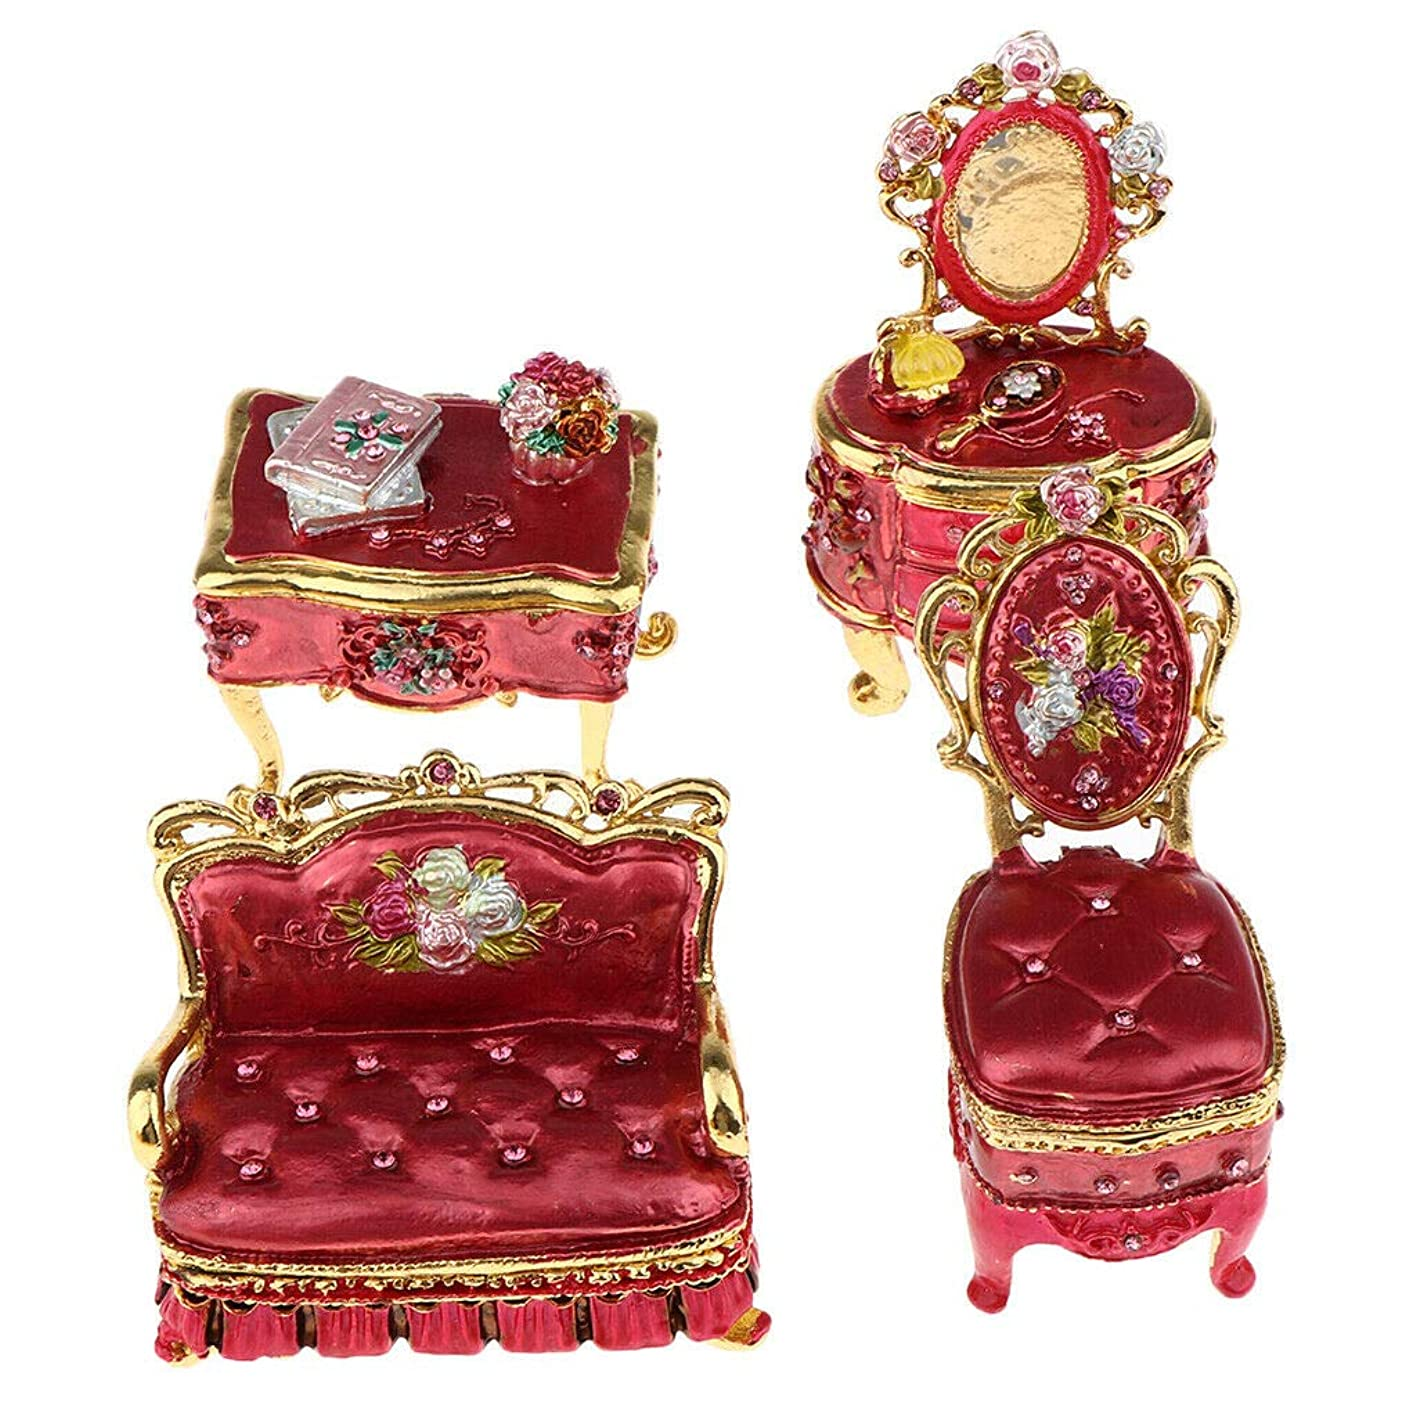 NATFUR 1:12 Dollhouse Mini Vintage Living Room Furniture Jewelry Box Model DIY Red qmdscfgyqul750